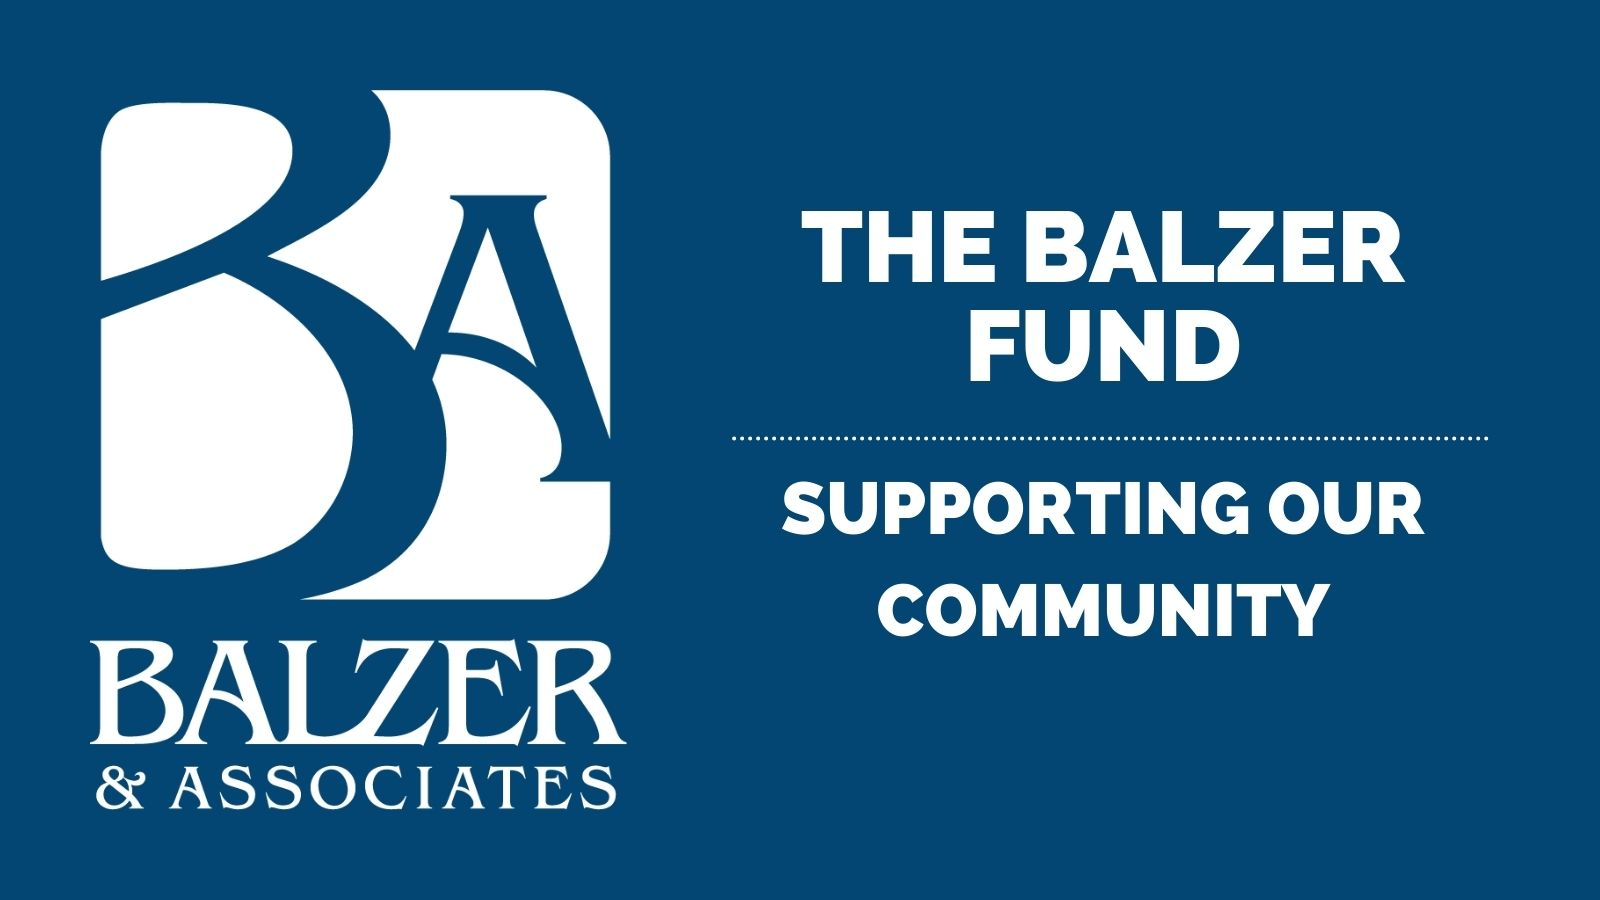 Balzer Fund basic